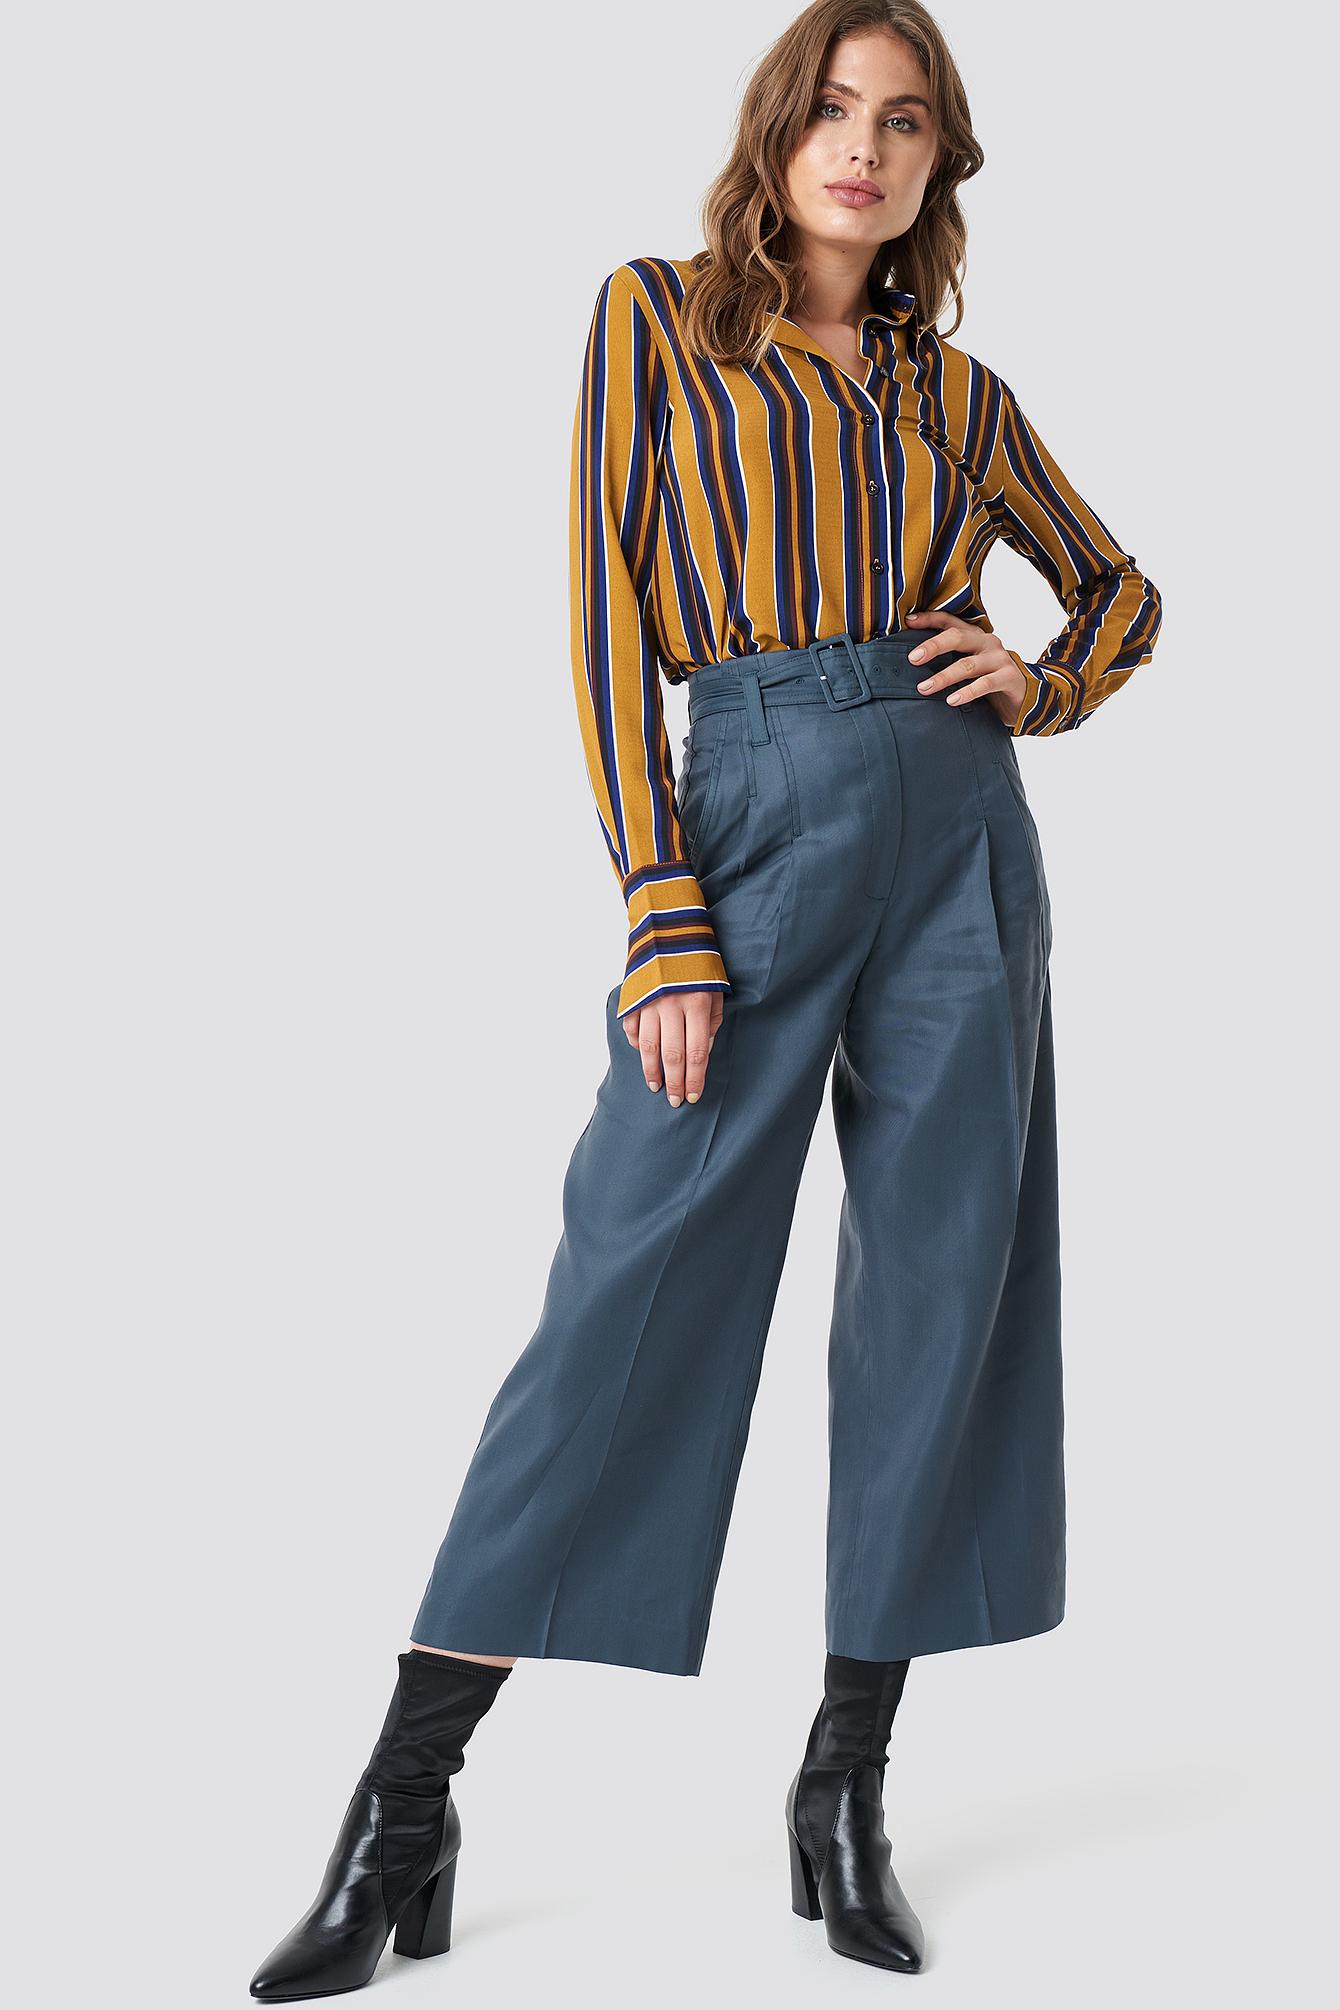 mango -  Linus Trousers - Blue,Navy